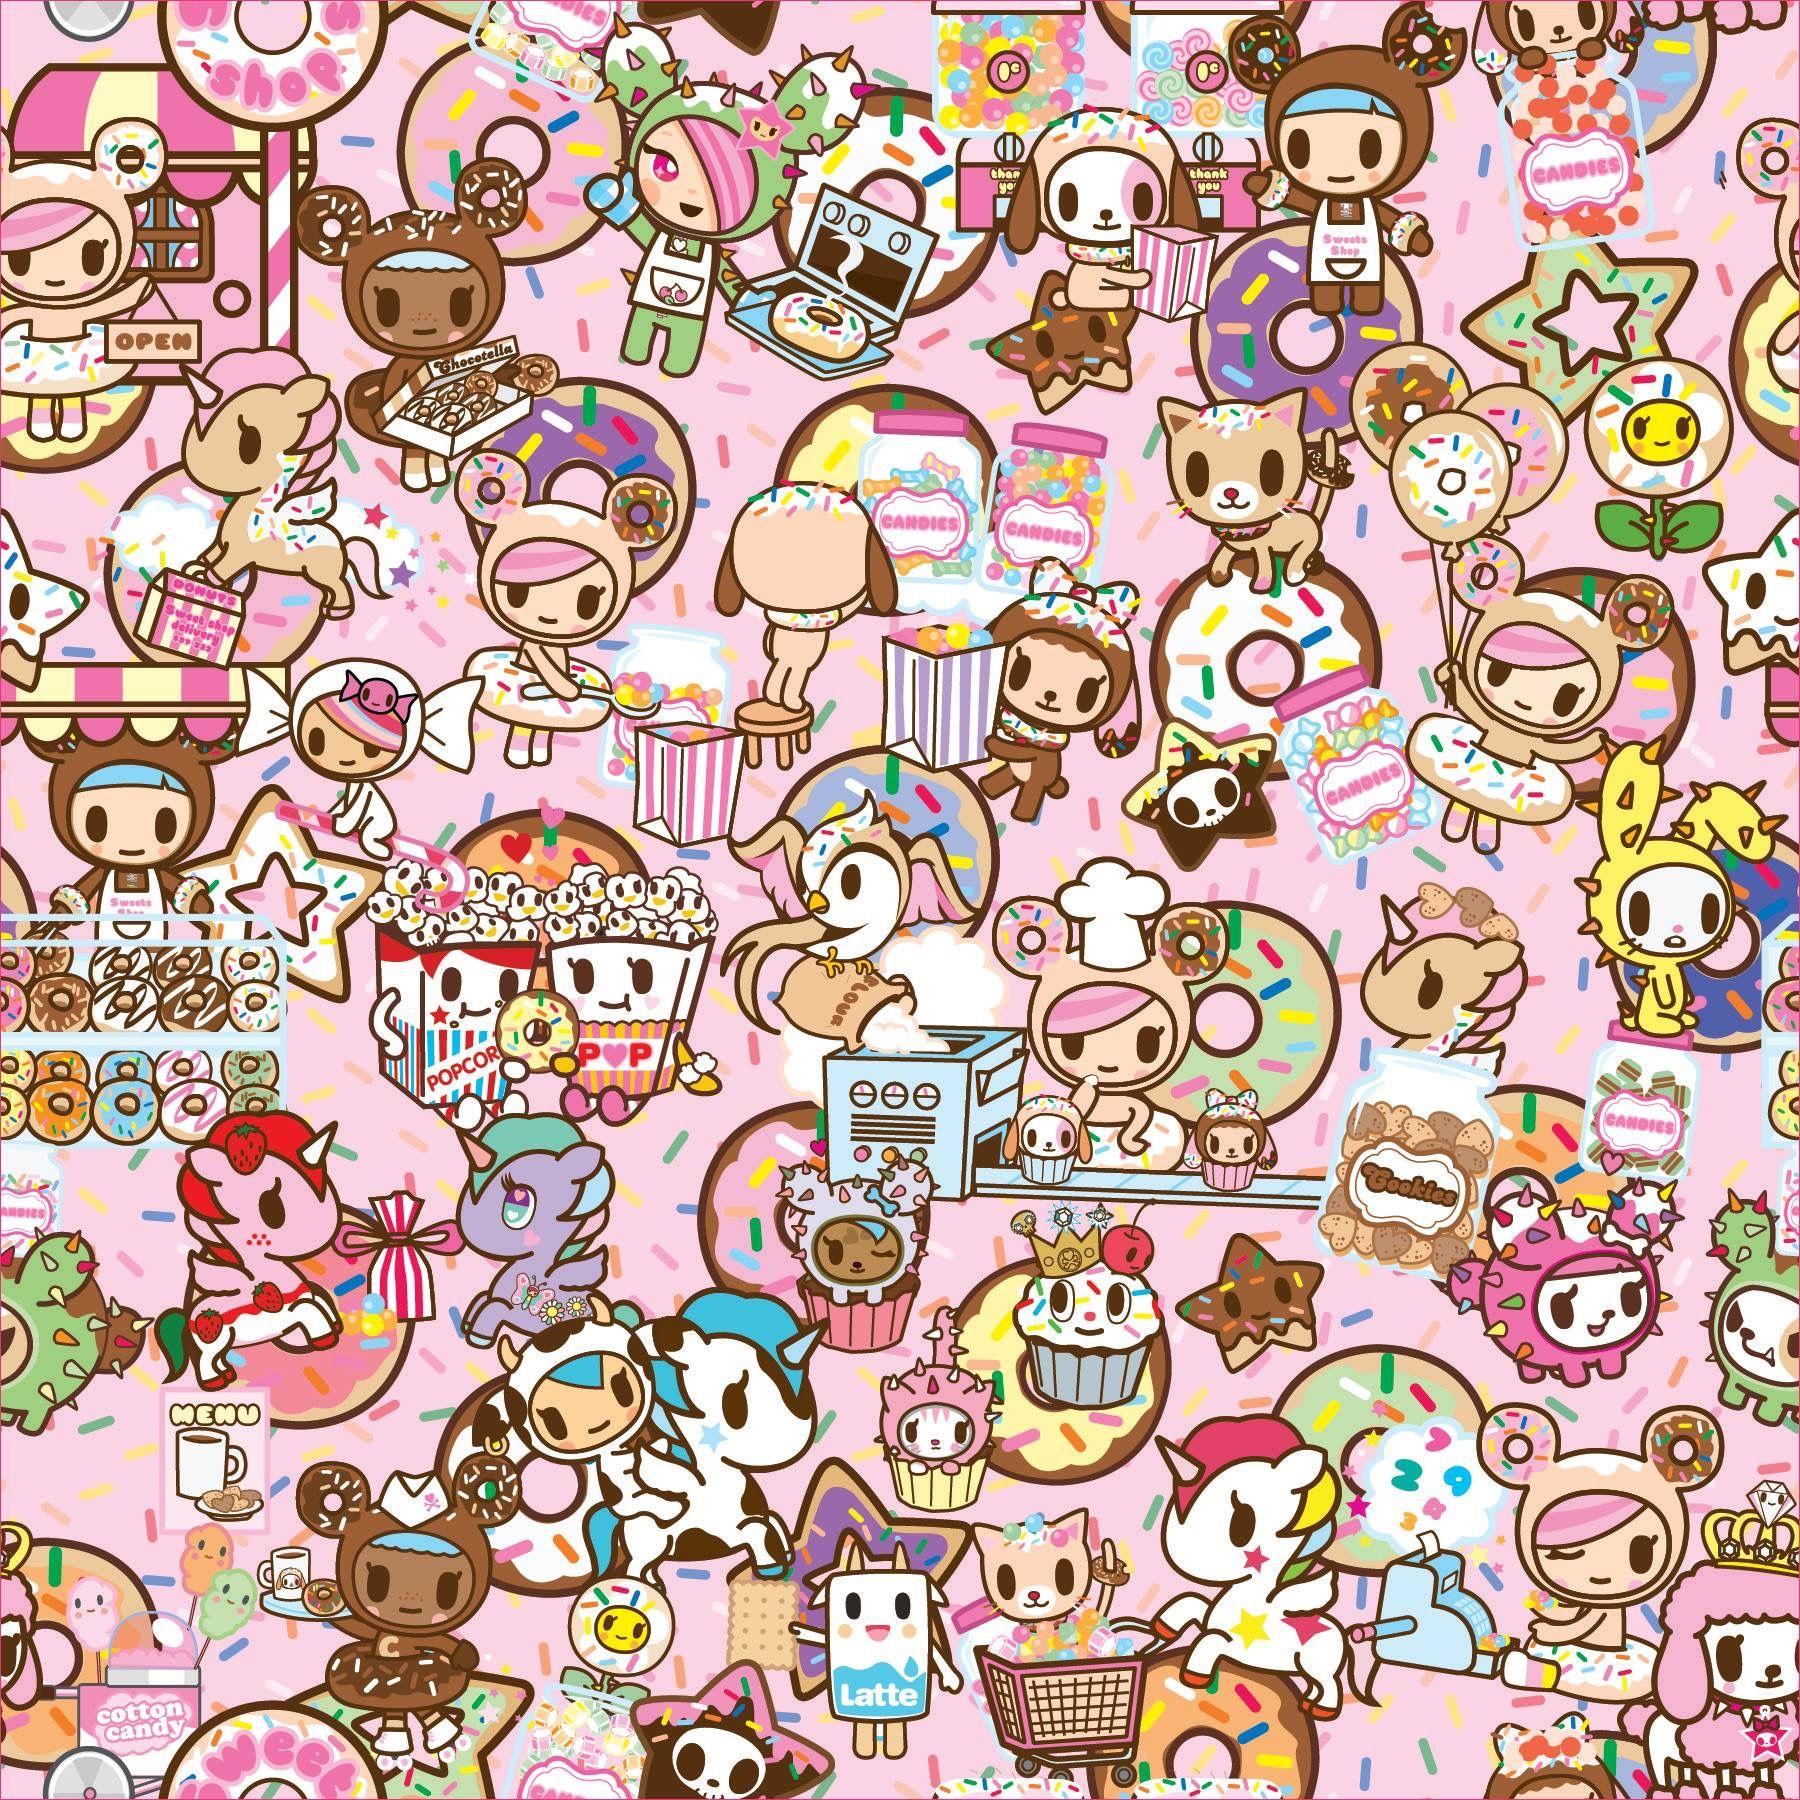 Tokidoki Background